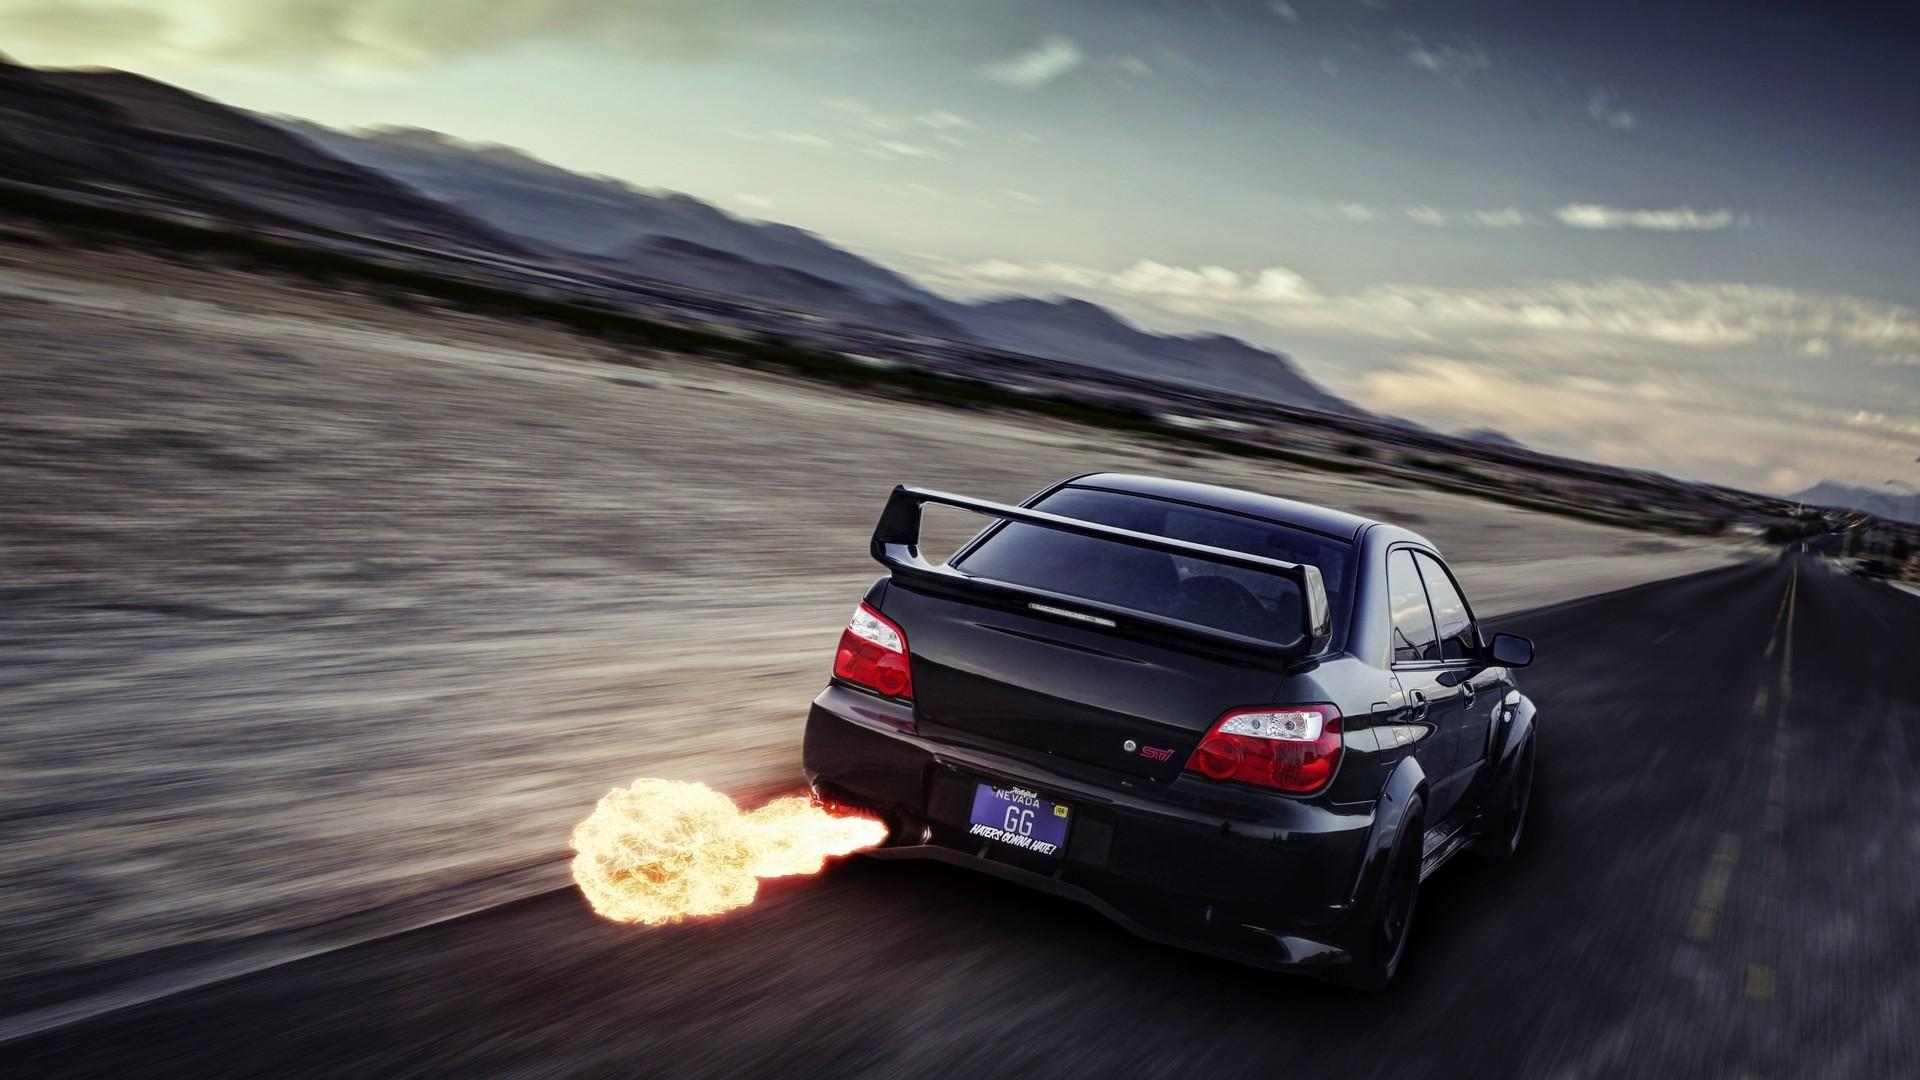 Nissan Gtr Car Hd Wallpapers Subaru Wrx Sti Backfire Flame Motion Blur Hd Wallpaper